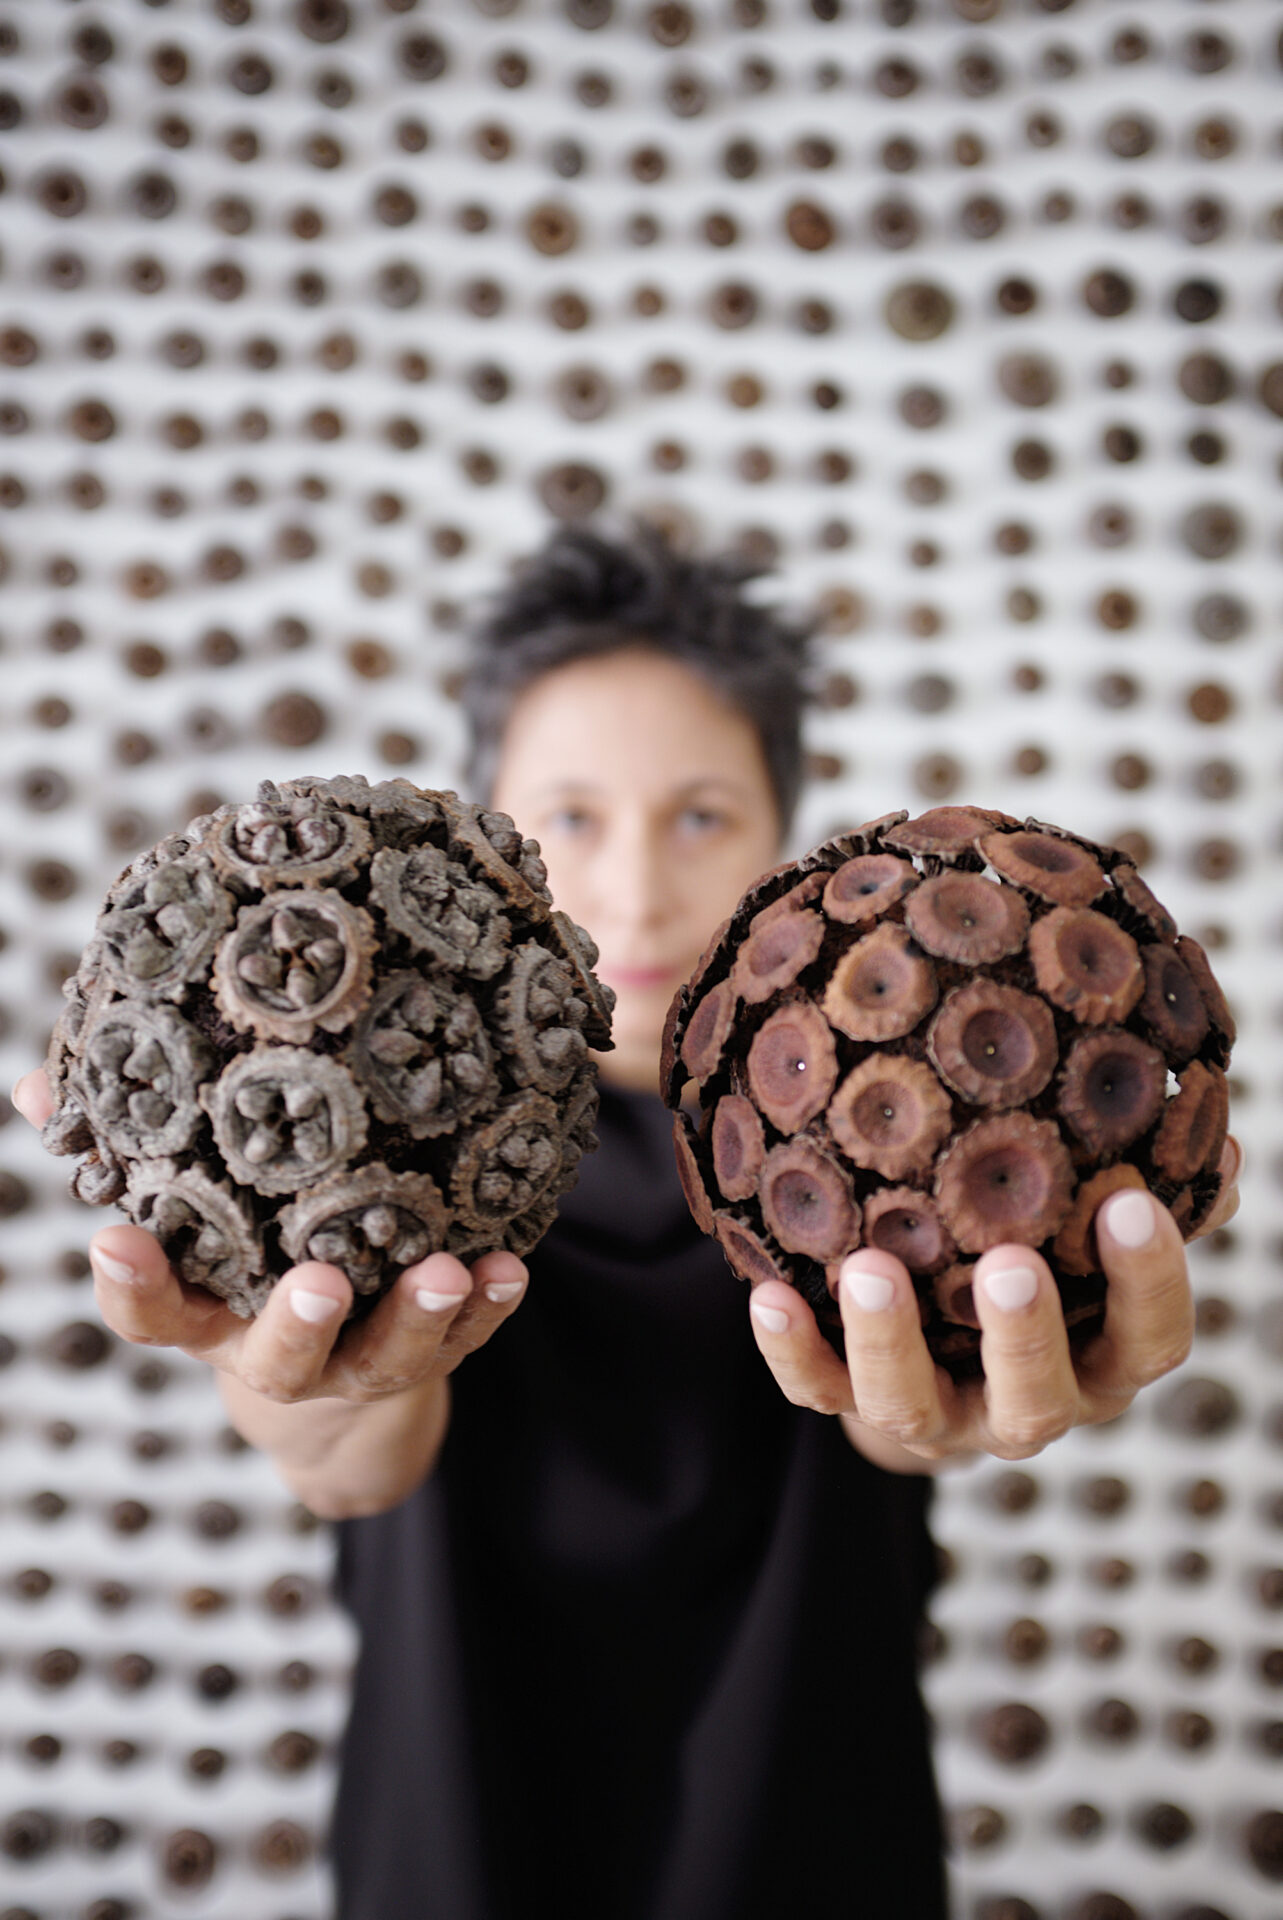 05_Maria Fernanda Cardoso with Eucalyptus Gumnuts Sphere sand wall 2021 Photo credit Jillian Nalty Courtesy of the artist and Sullivan + Strump